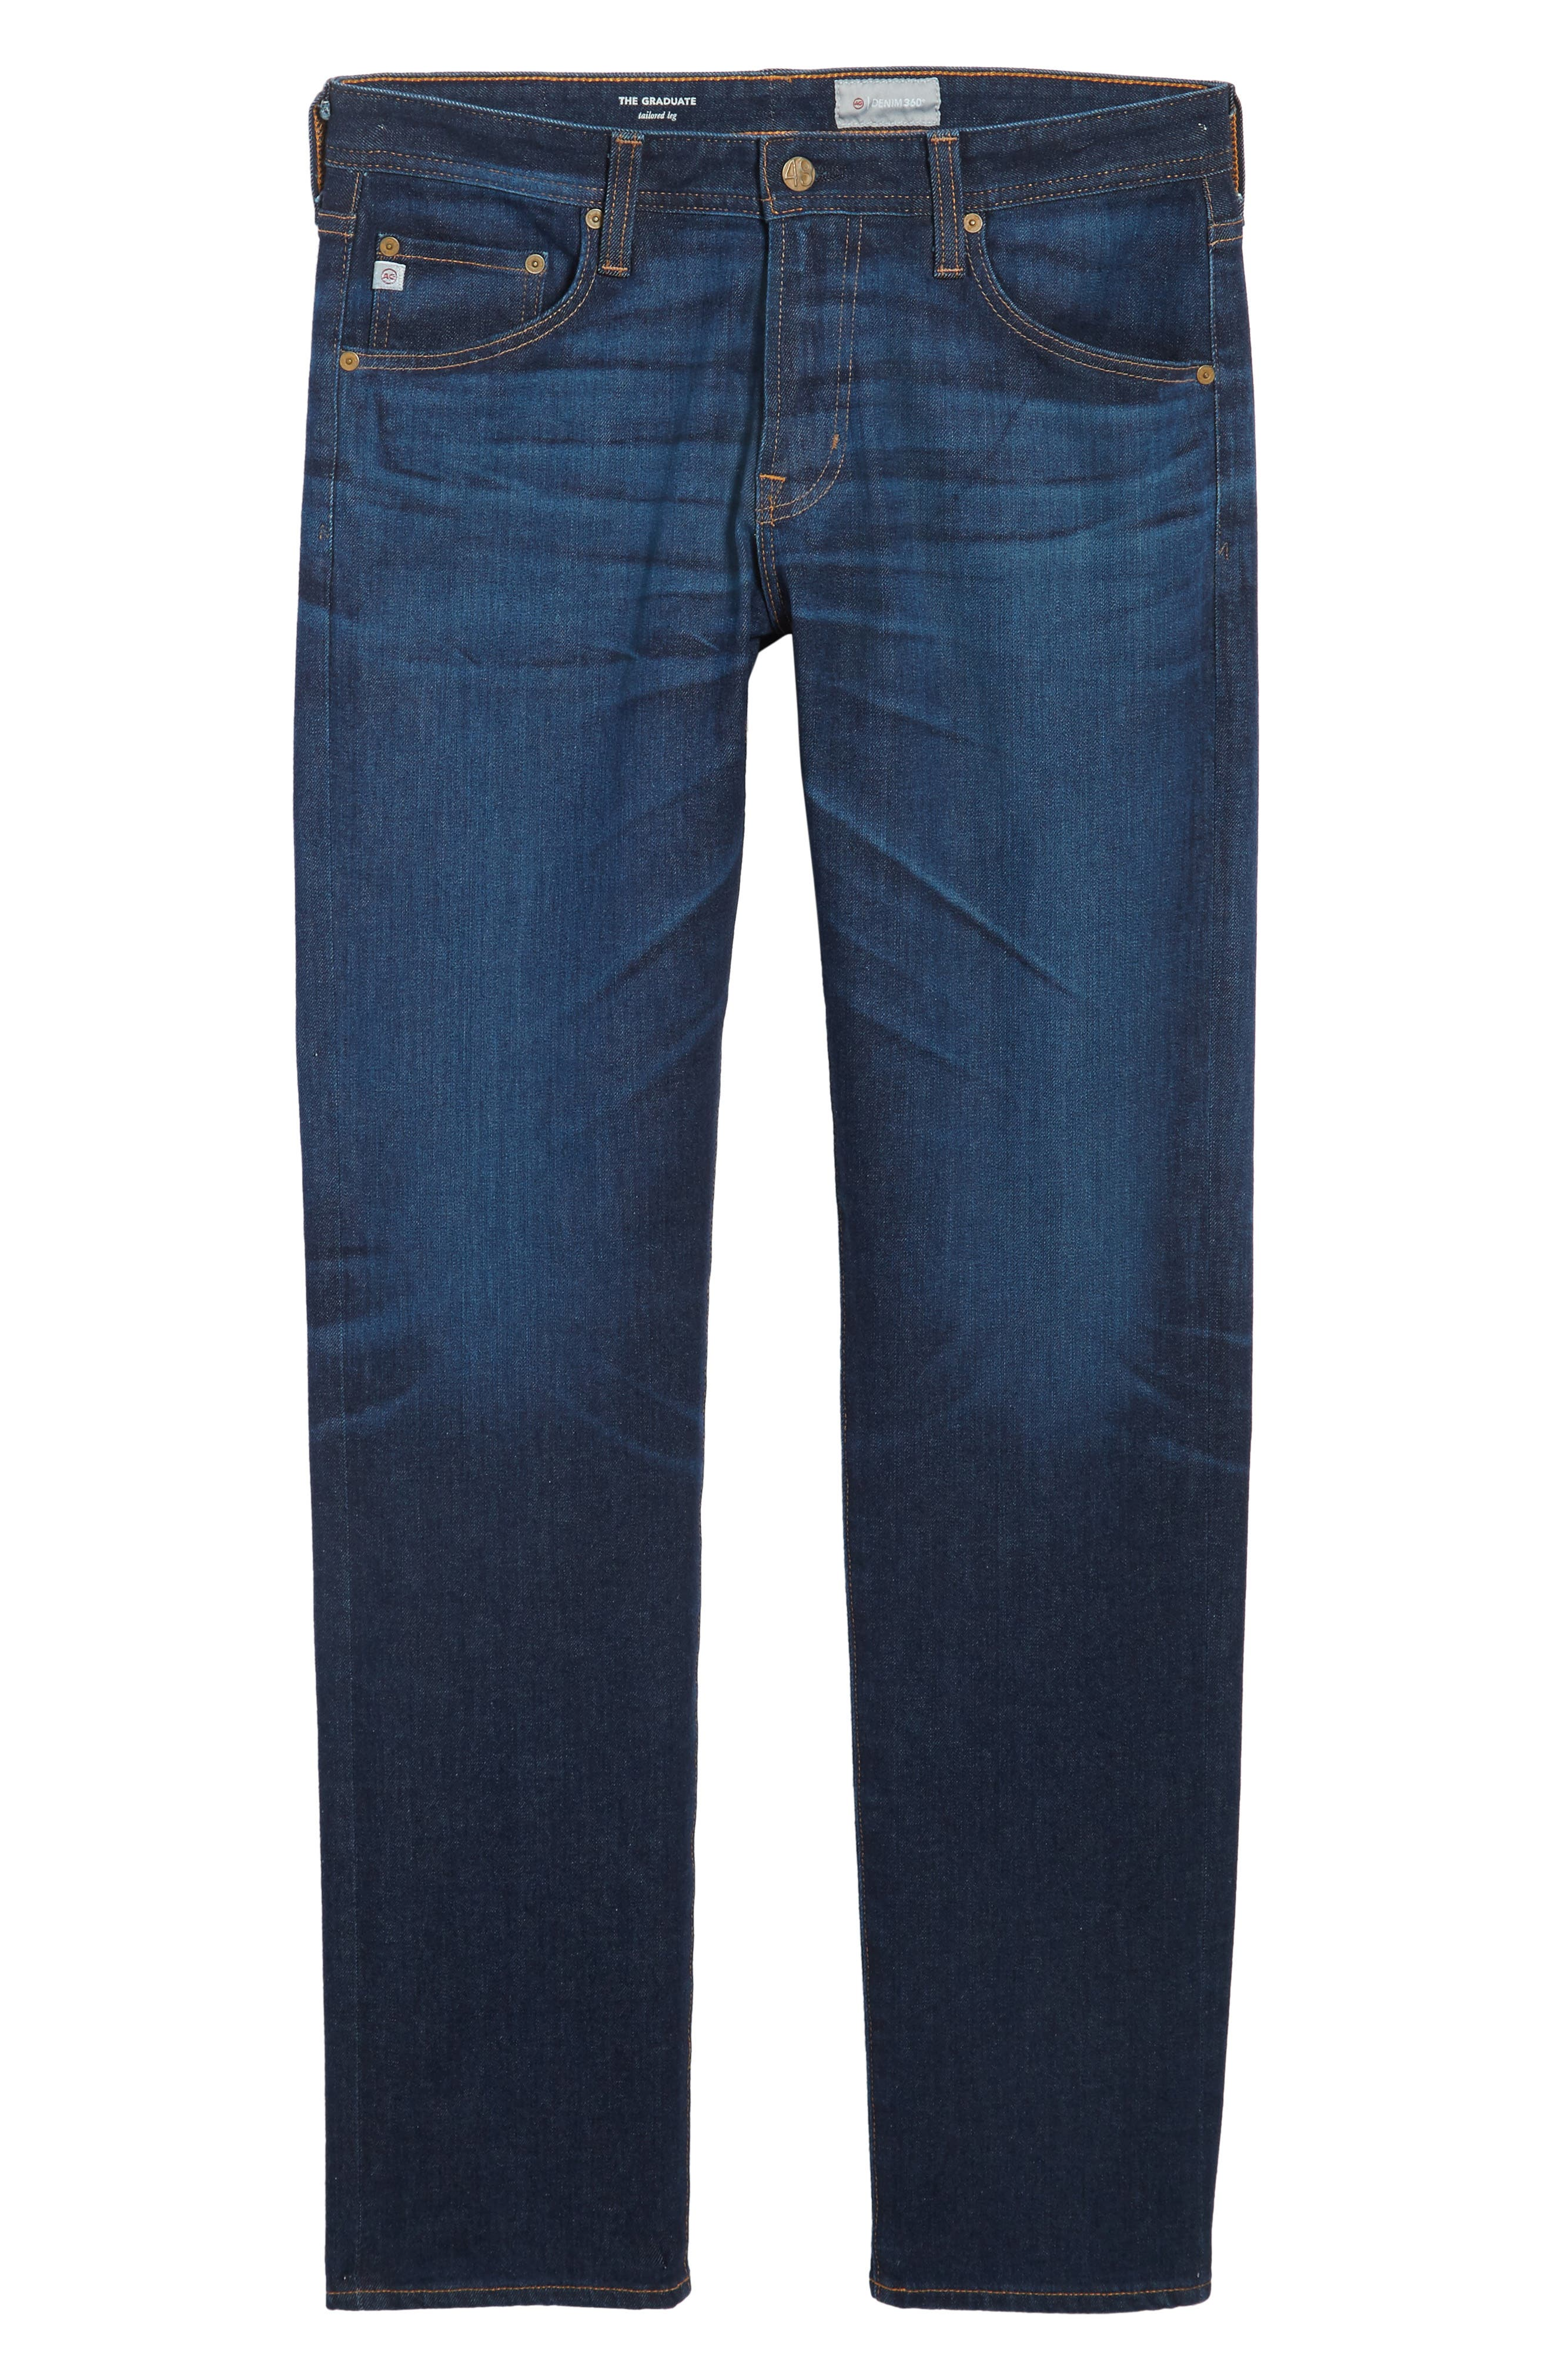 Graduate Slim Straight Fit Jeans,                             Alternate thumbnail 6, color,